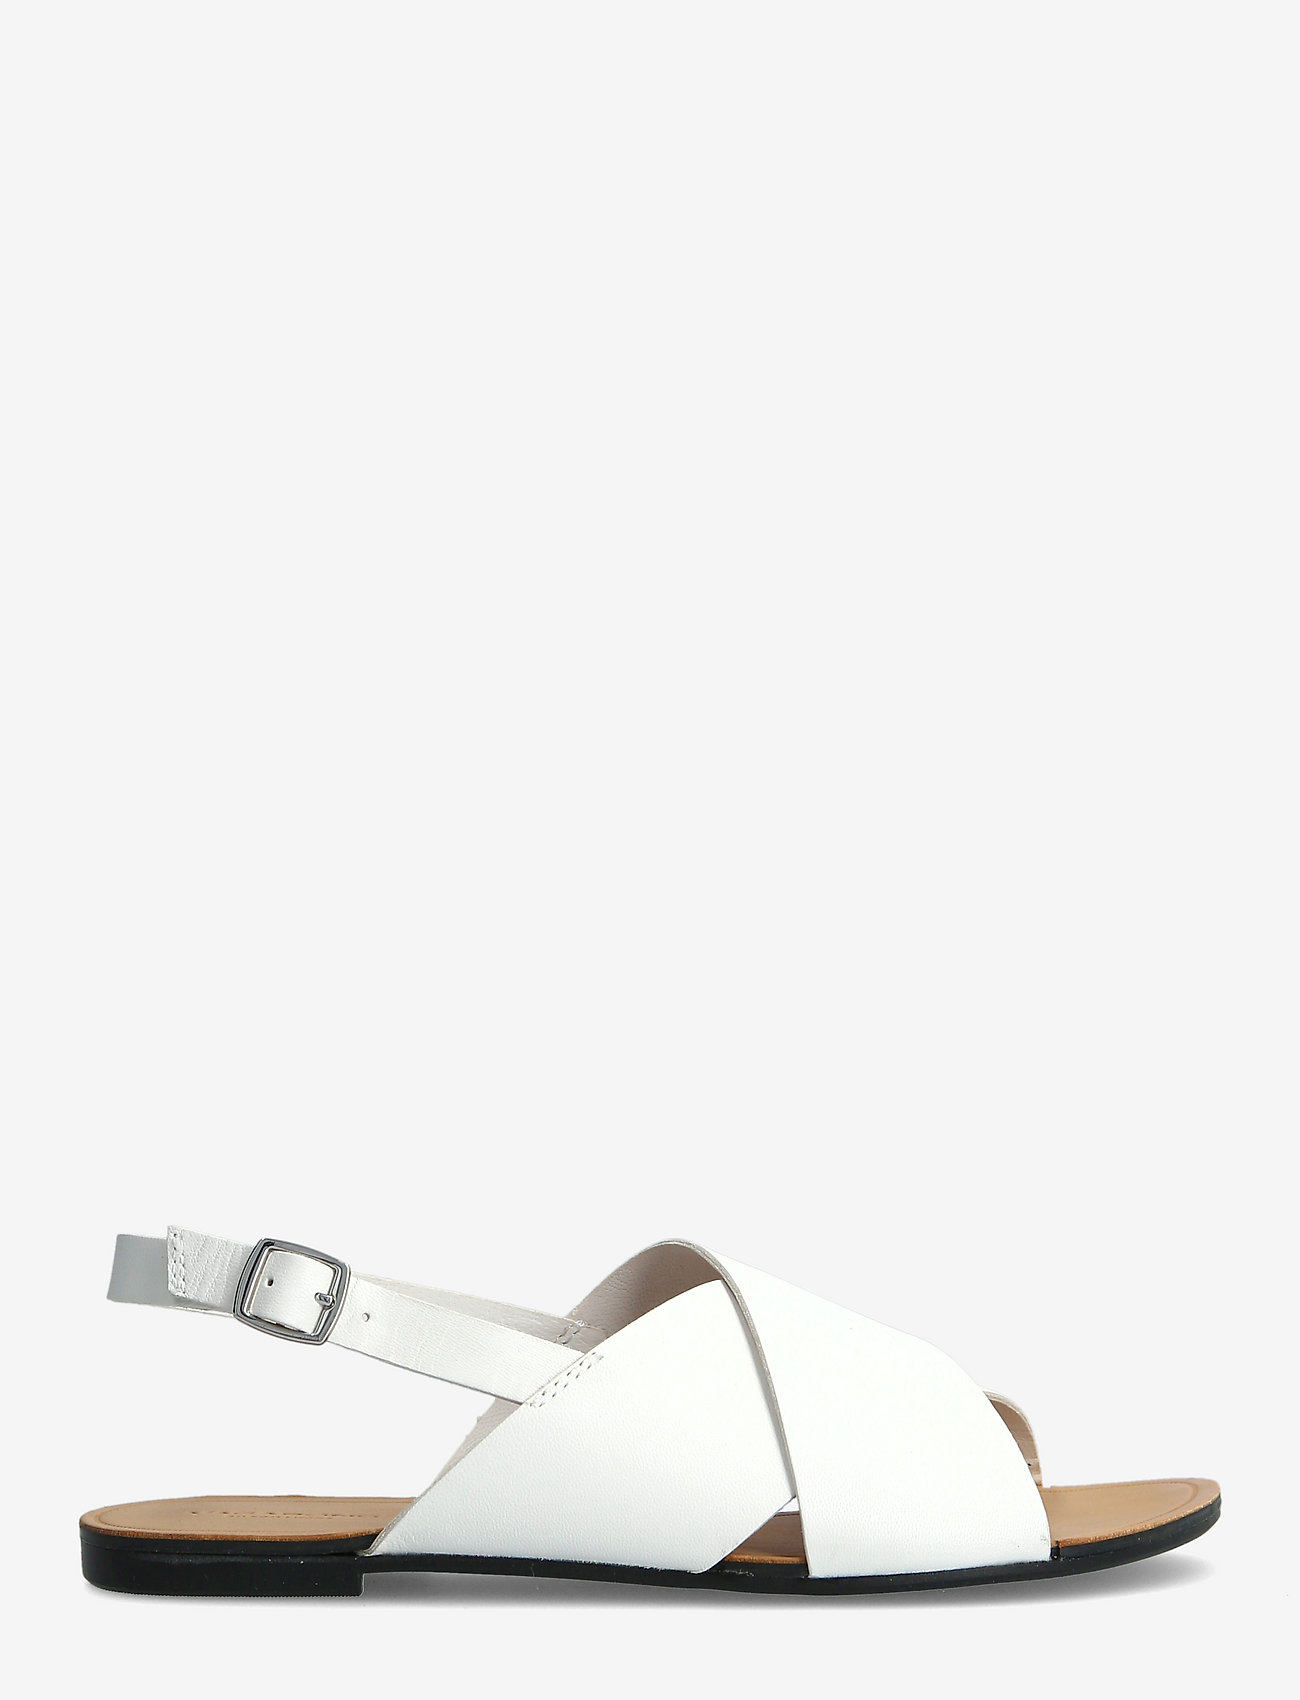 VAGABOND - TIA - płaskie sandały - white - 1